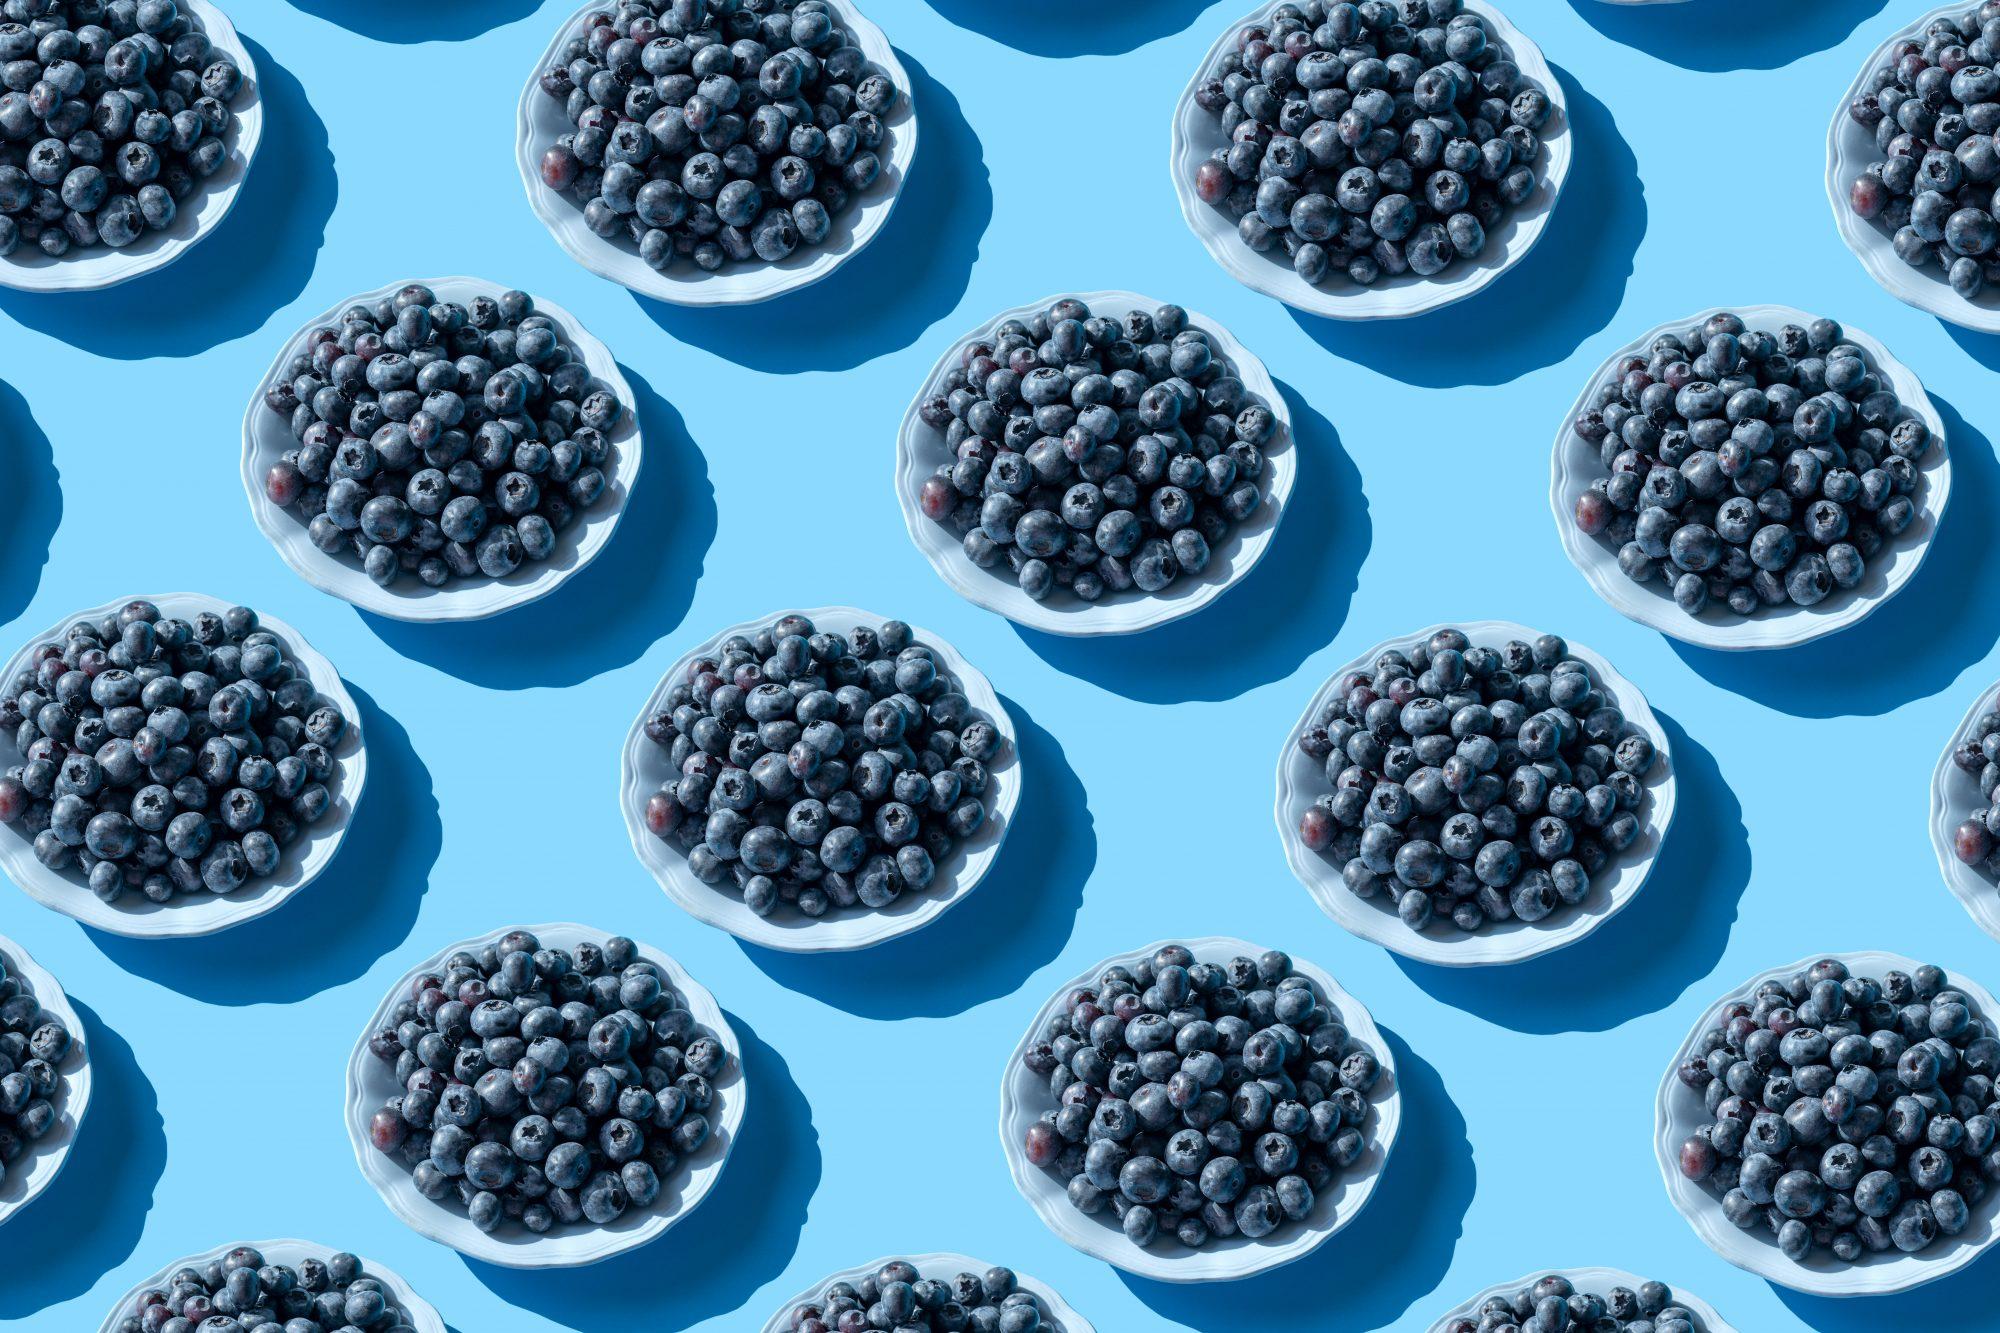 Blueberry pattern Getty 7/16/20